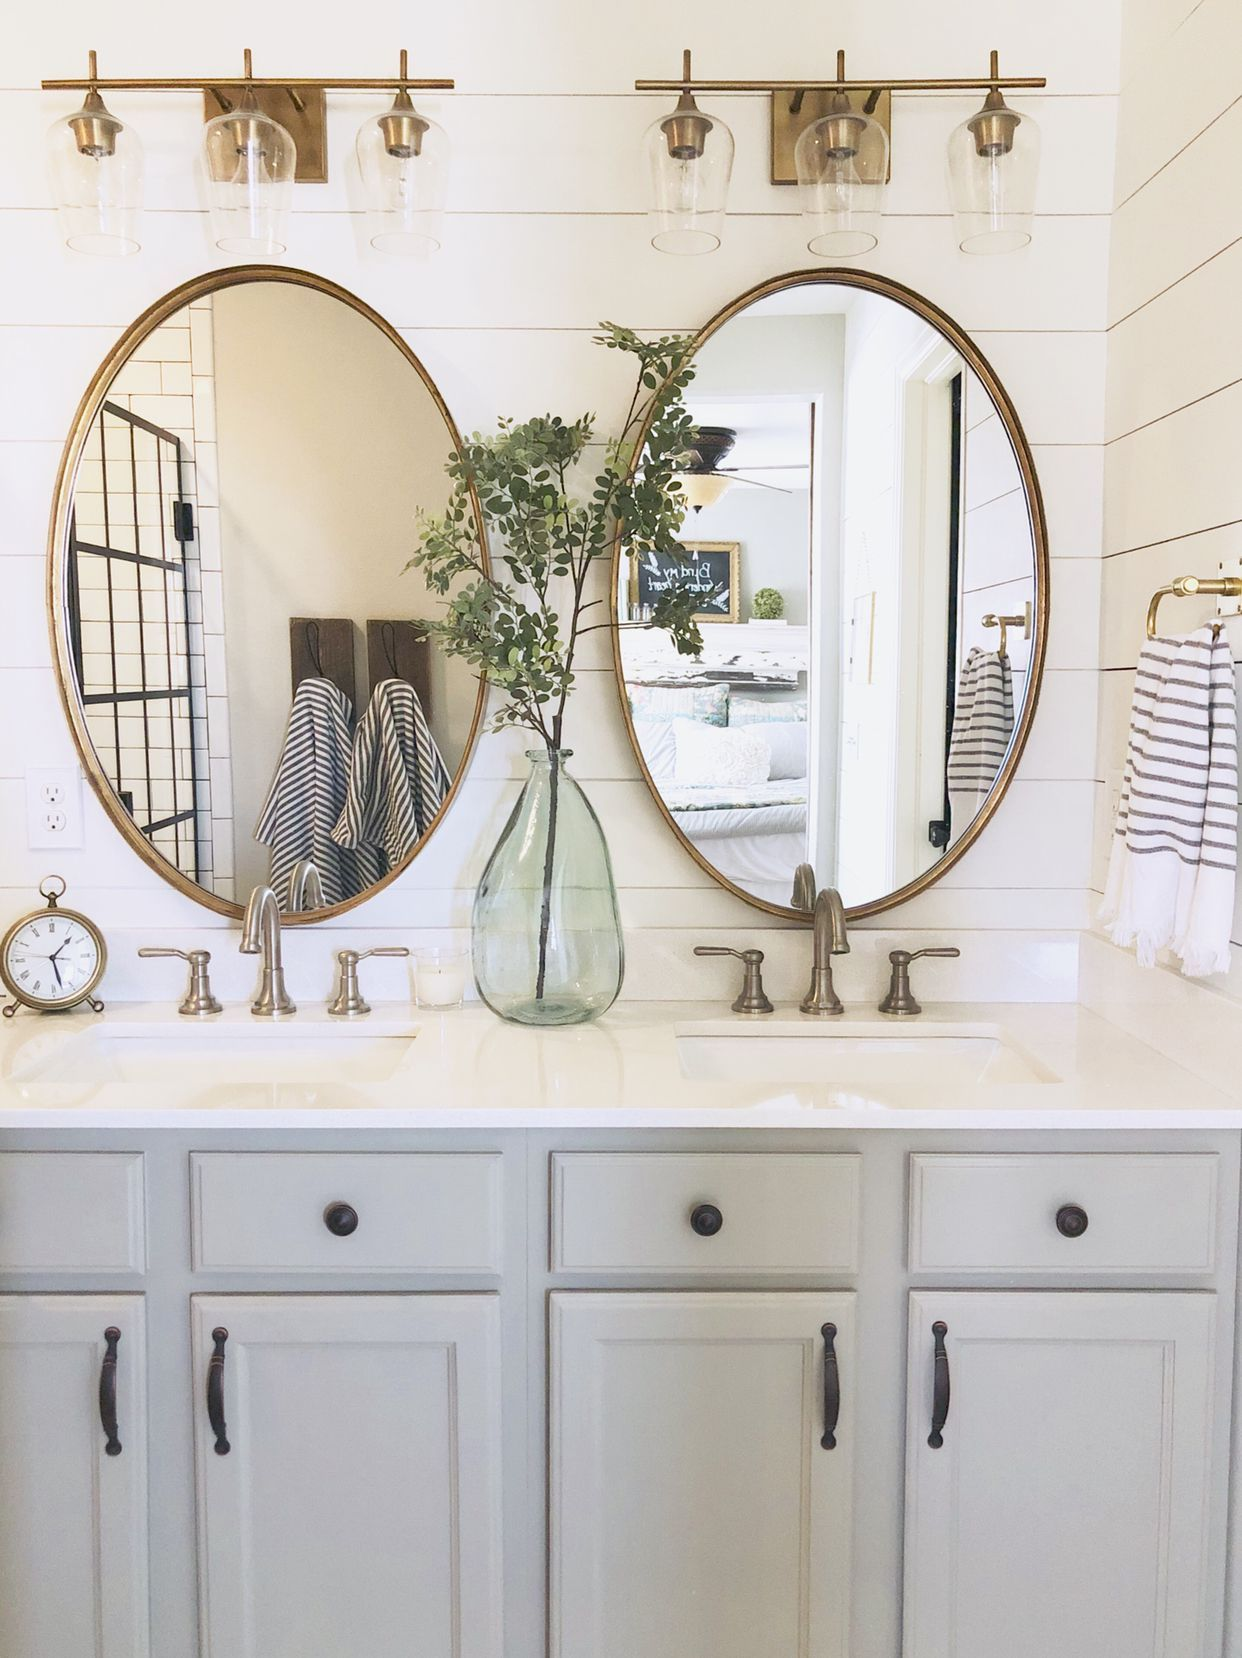 Shiplap Brass Lighting Oval Mirrors Mixed Metals Bathroom Inspiration Decor Oval Mirror Bathroom Oval Bathroom Mirror Ideas